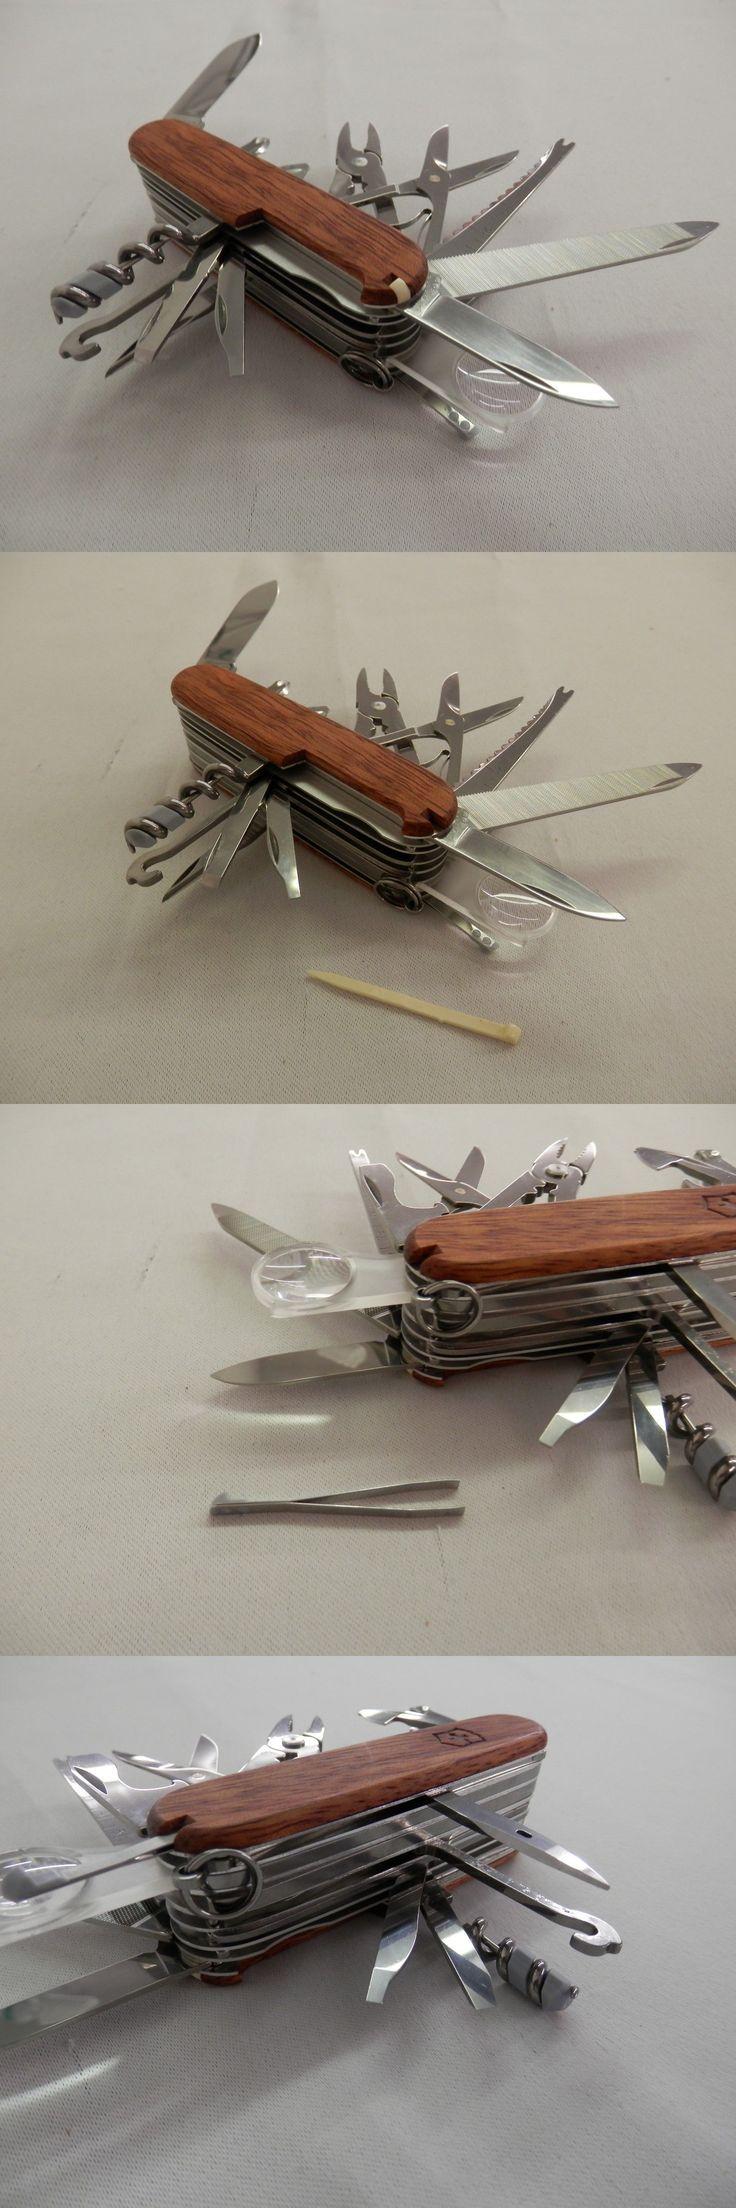 Pocket Multi Tools 75236: Victorinox Swiss Army Swisschamp Pocket Knife, Hardwood -> BUY IT NOW ONLY: $74.99 on eBay!